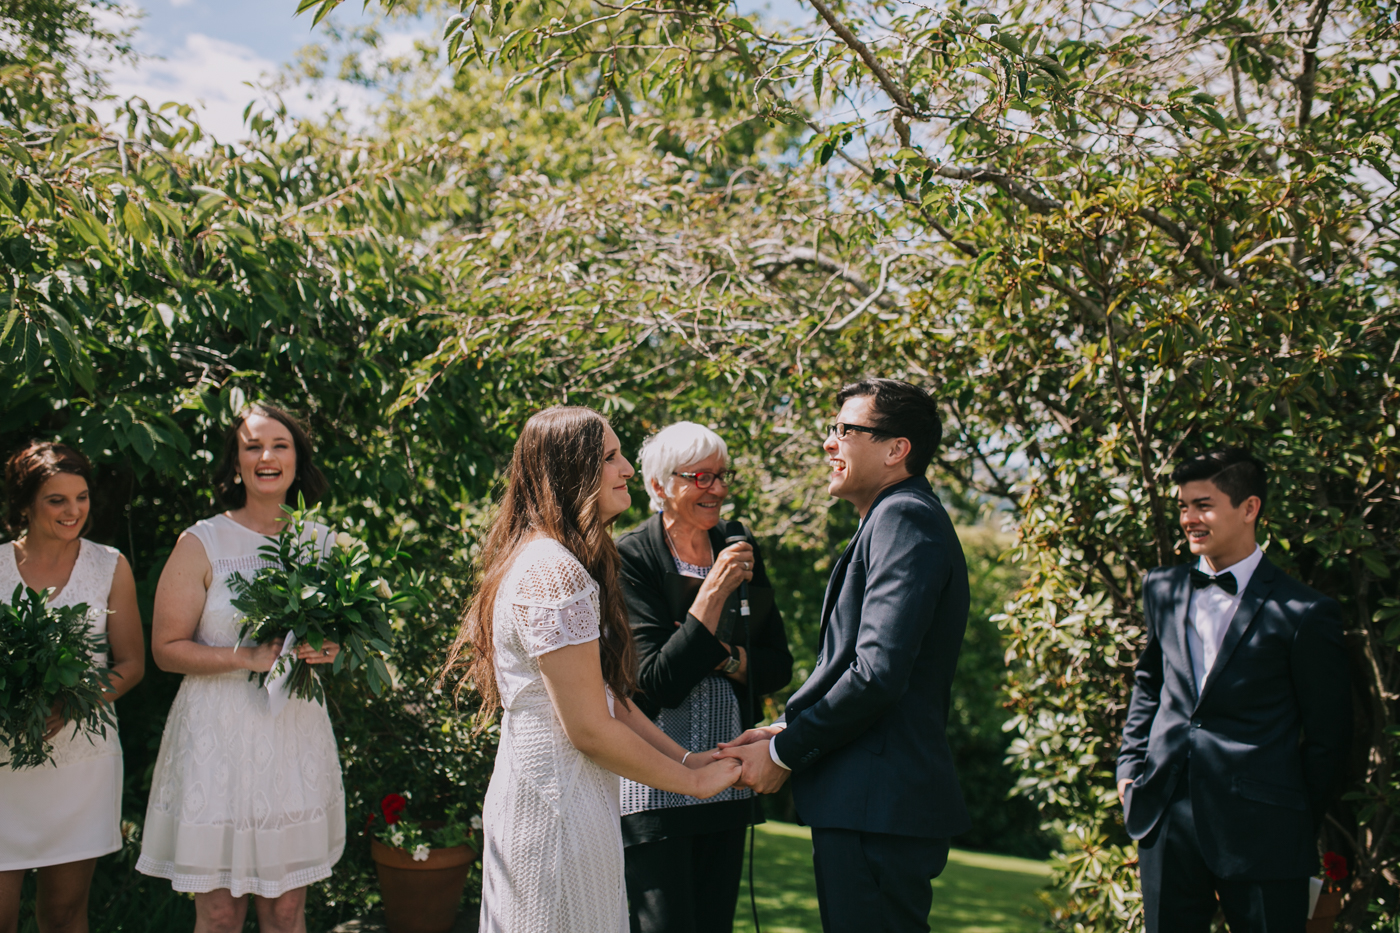 Ariana & Tim - Dunedin, New Zealand Wedding - Destination Wedding - Samantha Heather Photography-99.jpg